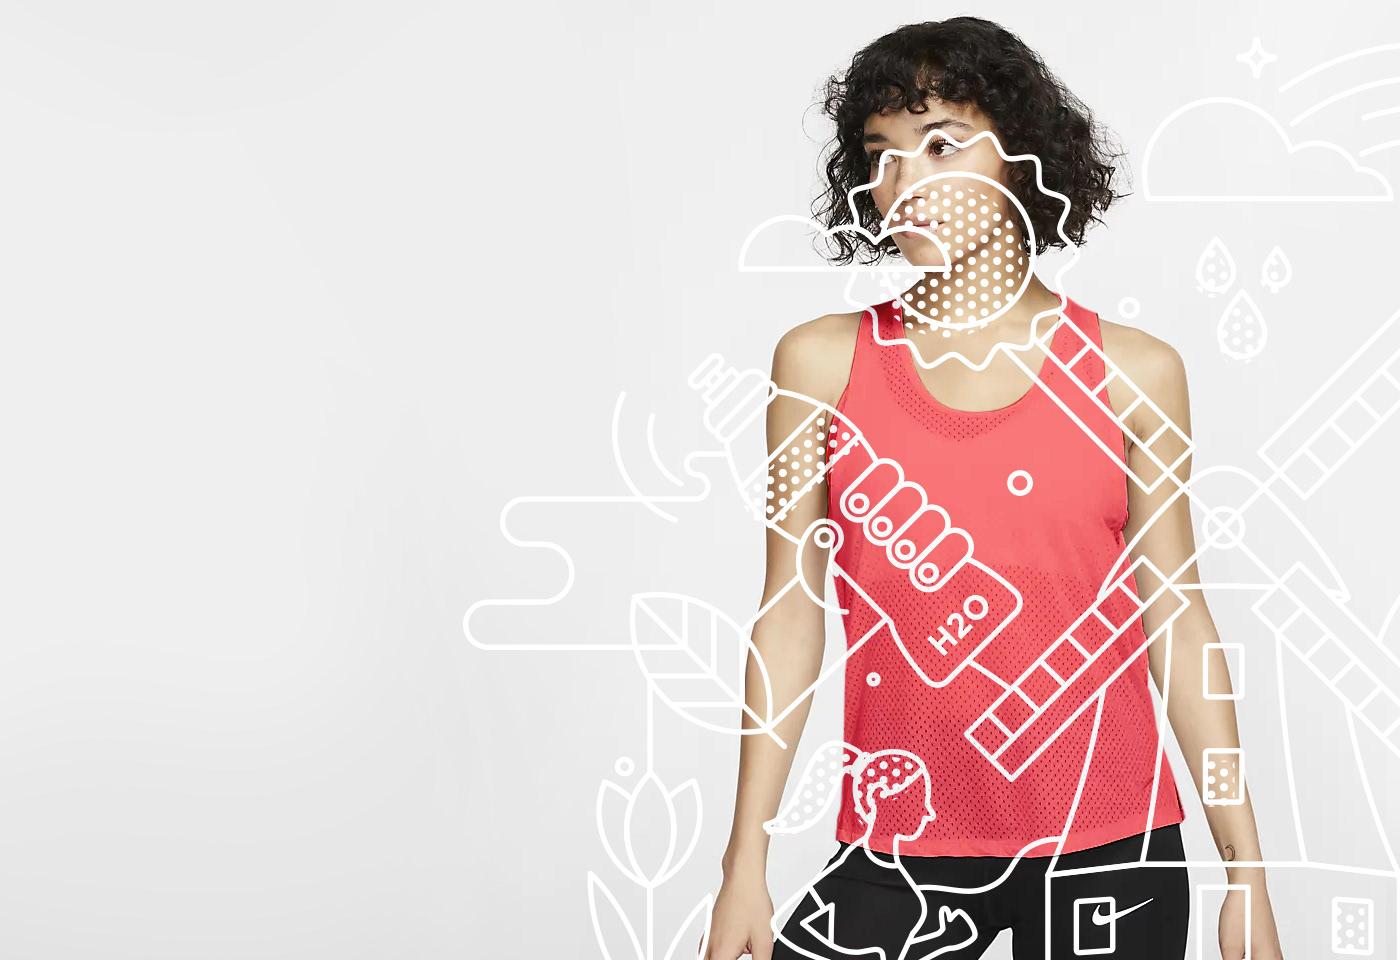 Line art illustration for Dri-FIT shirt